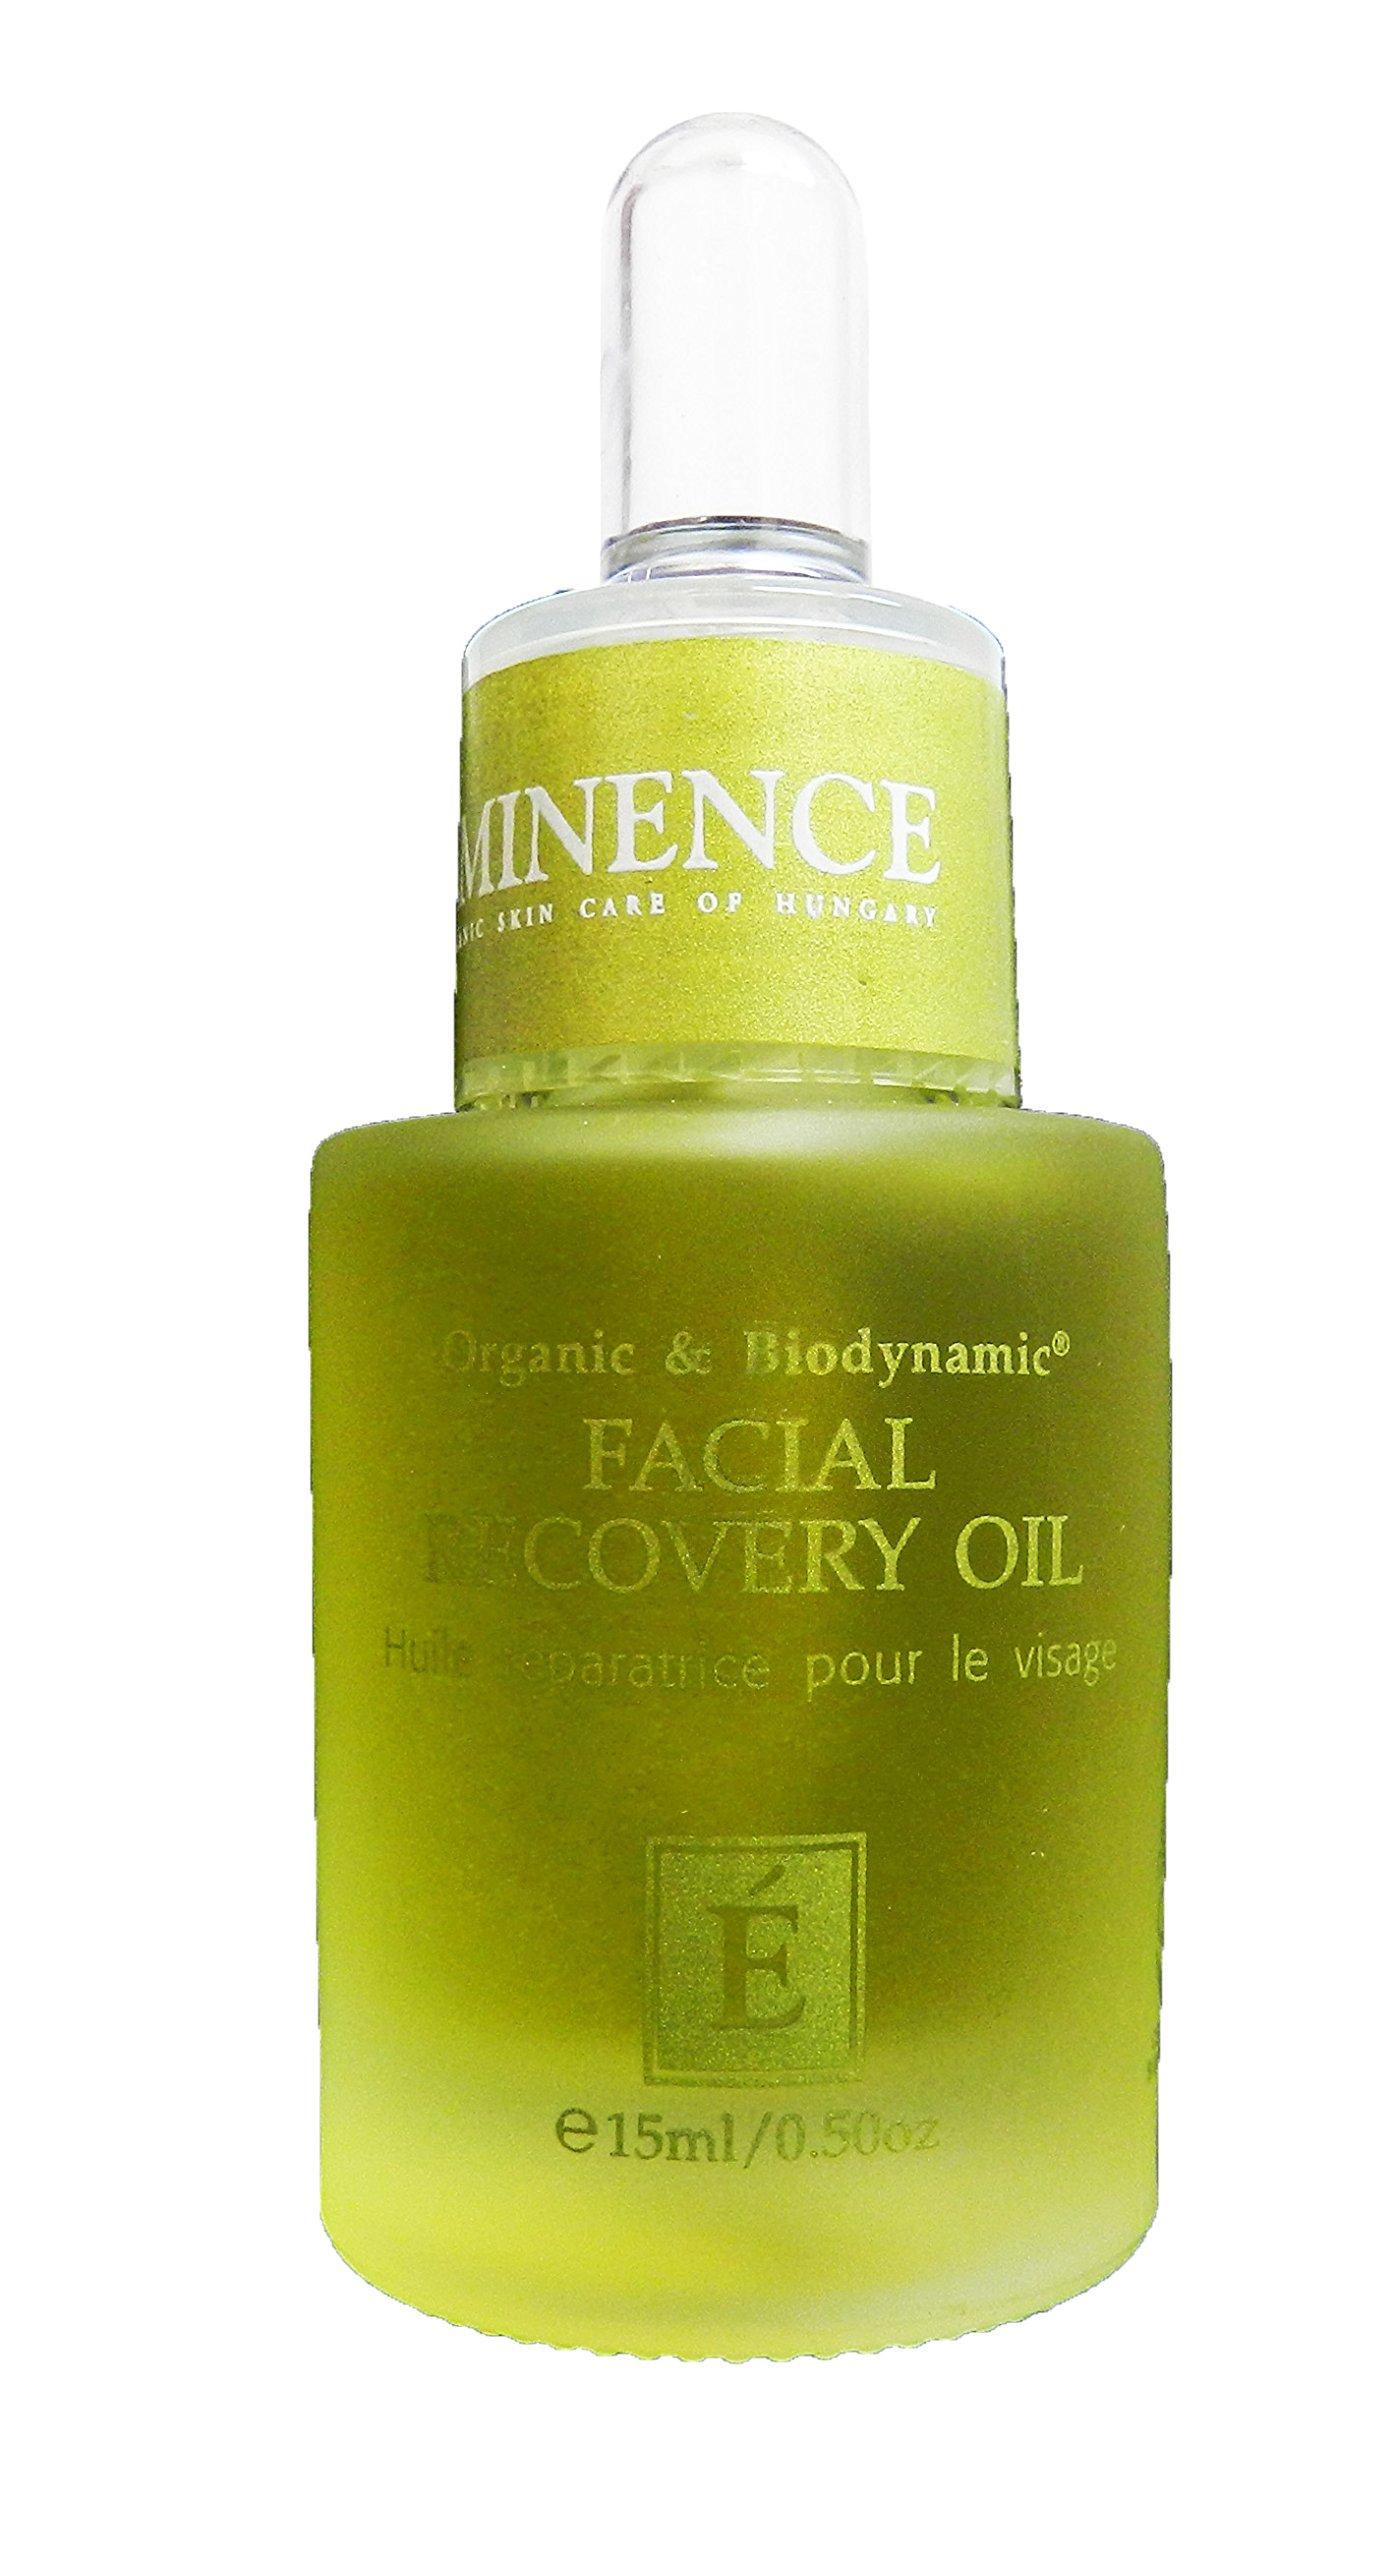 Eminence Facial Recovery Oil, 0.5 Ounce